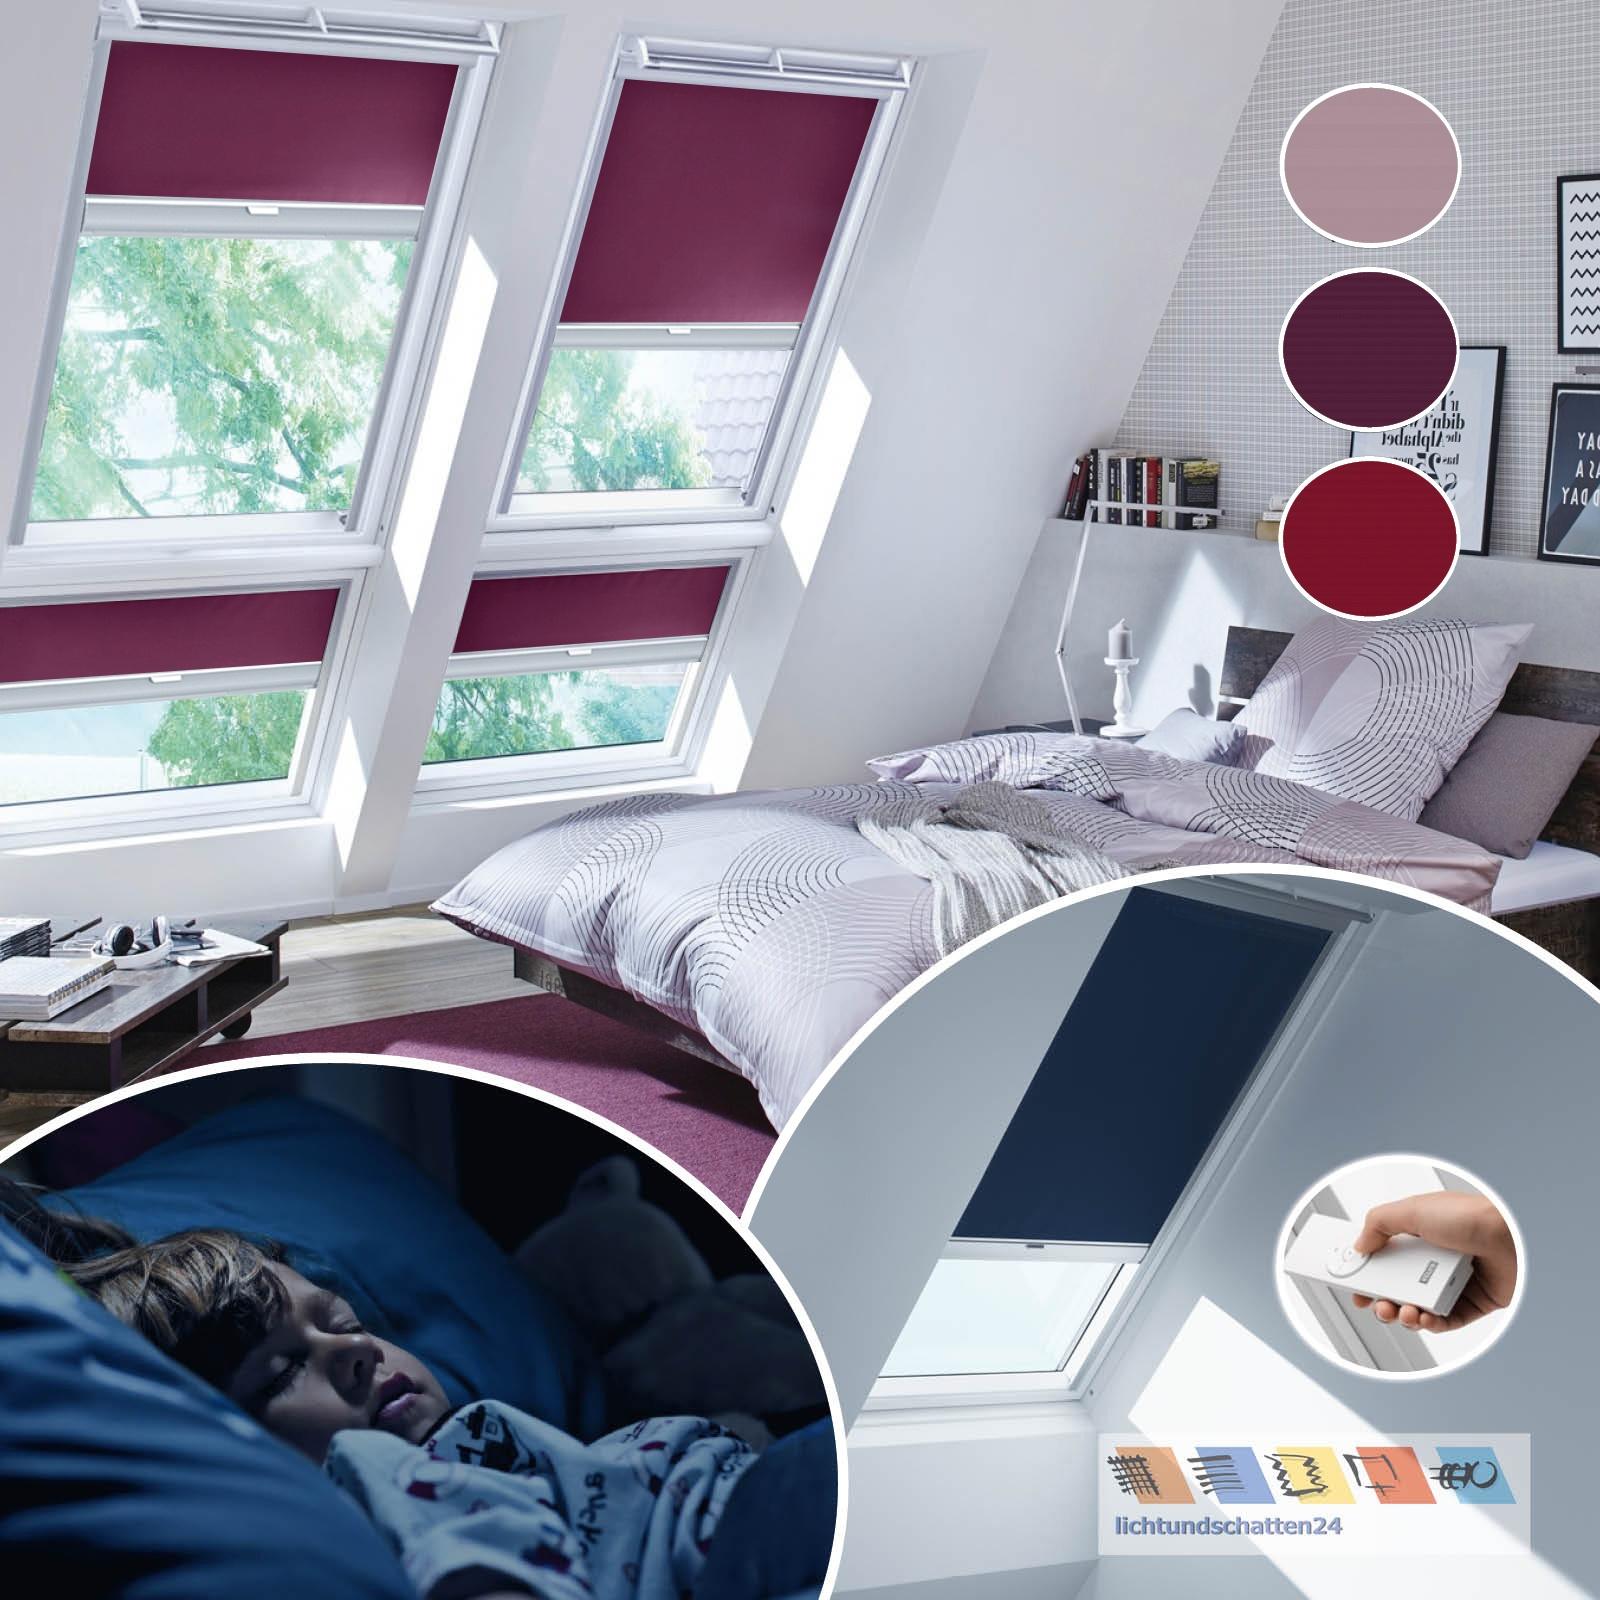 orig velux elektro verdunkelungsrollo 4560 4561 4565 ggl gpl ghl ggu gpu ghu ebay. Black Bedroom Furniture Sets. Home Design Ideas